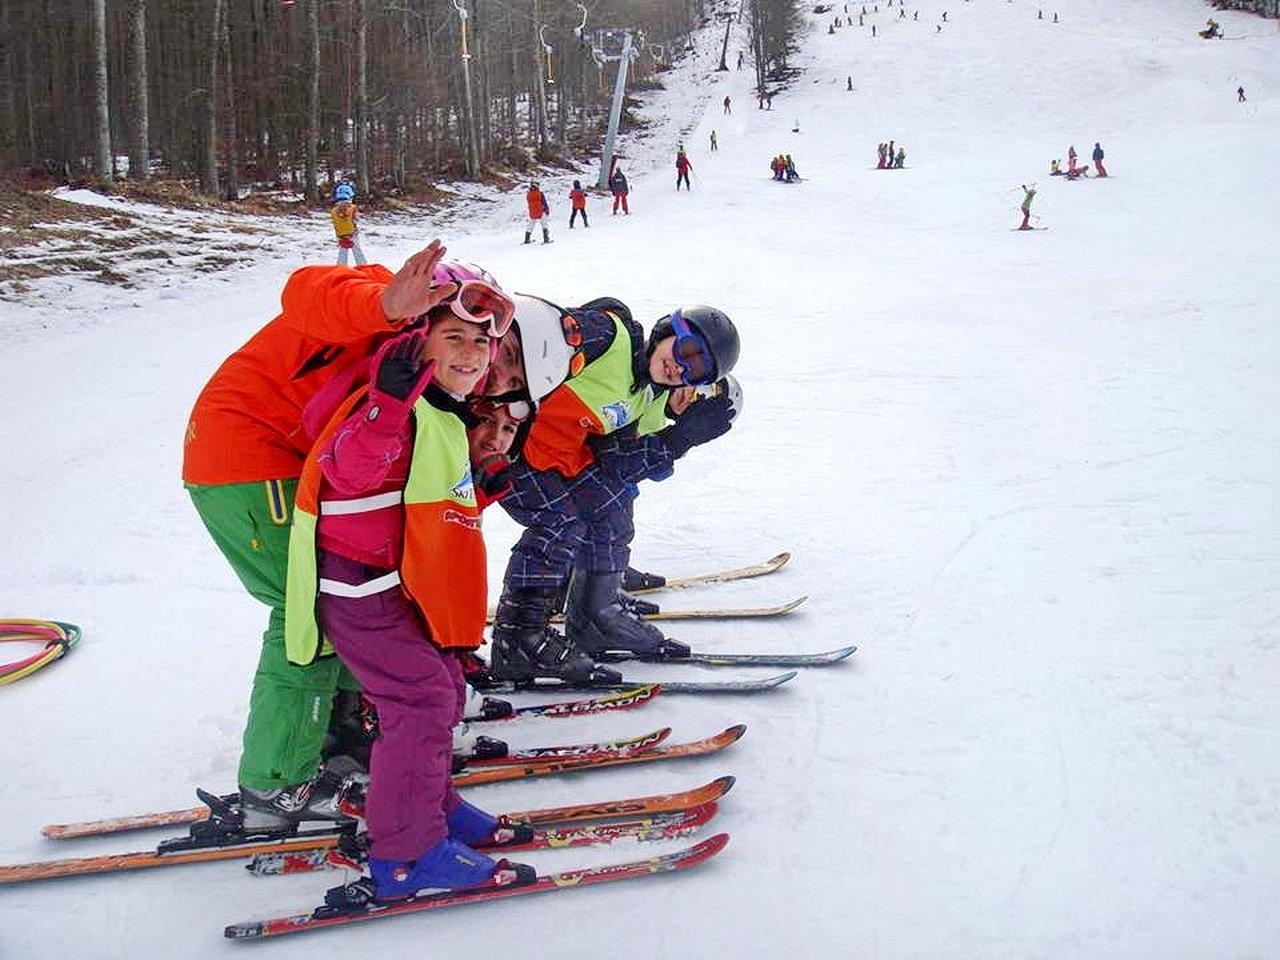 skiteam.gr-ski-academy-thessaloniki-2nd-weekend-18-19-january-2015-3-5-pigadiai-05